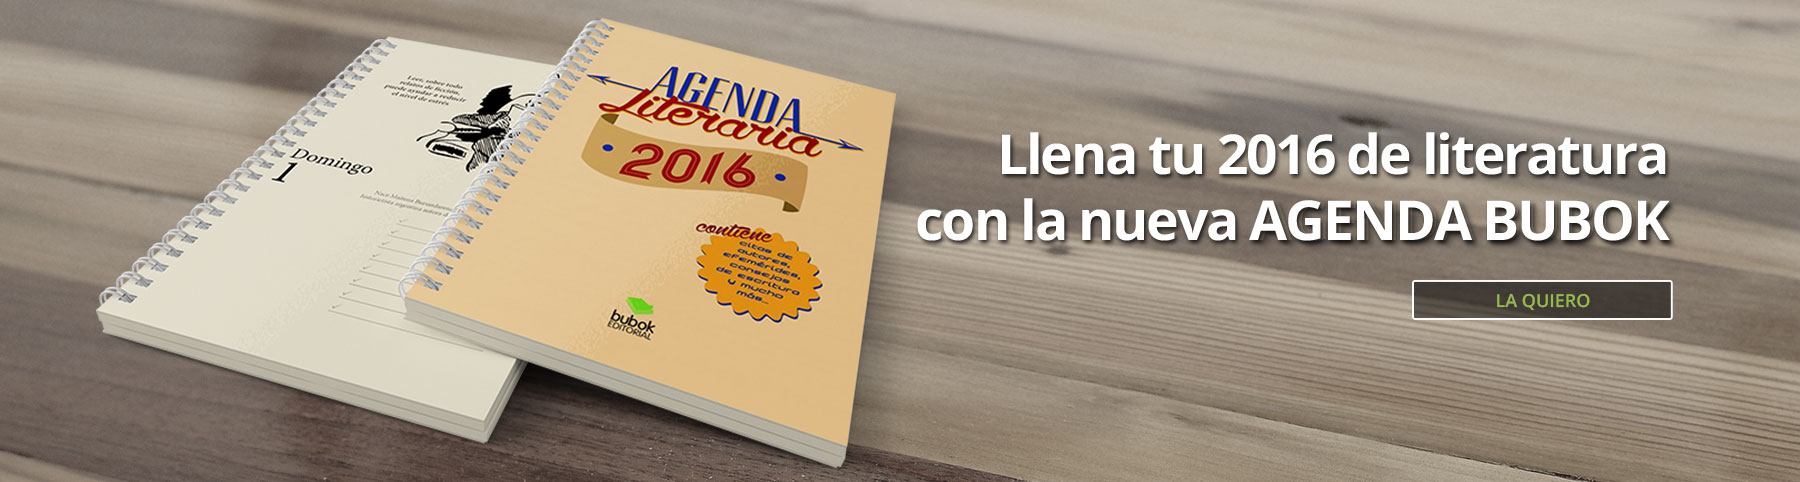 http://www.bubok.com.mx/libros/199030/Agenda-Literaria-Bubok?utm_source=Web%20&utm_medium=Display&utm_term=Home-Roller&utm_content=Producto&utm_campaign=AgendaB16